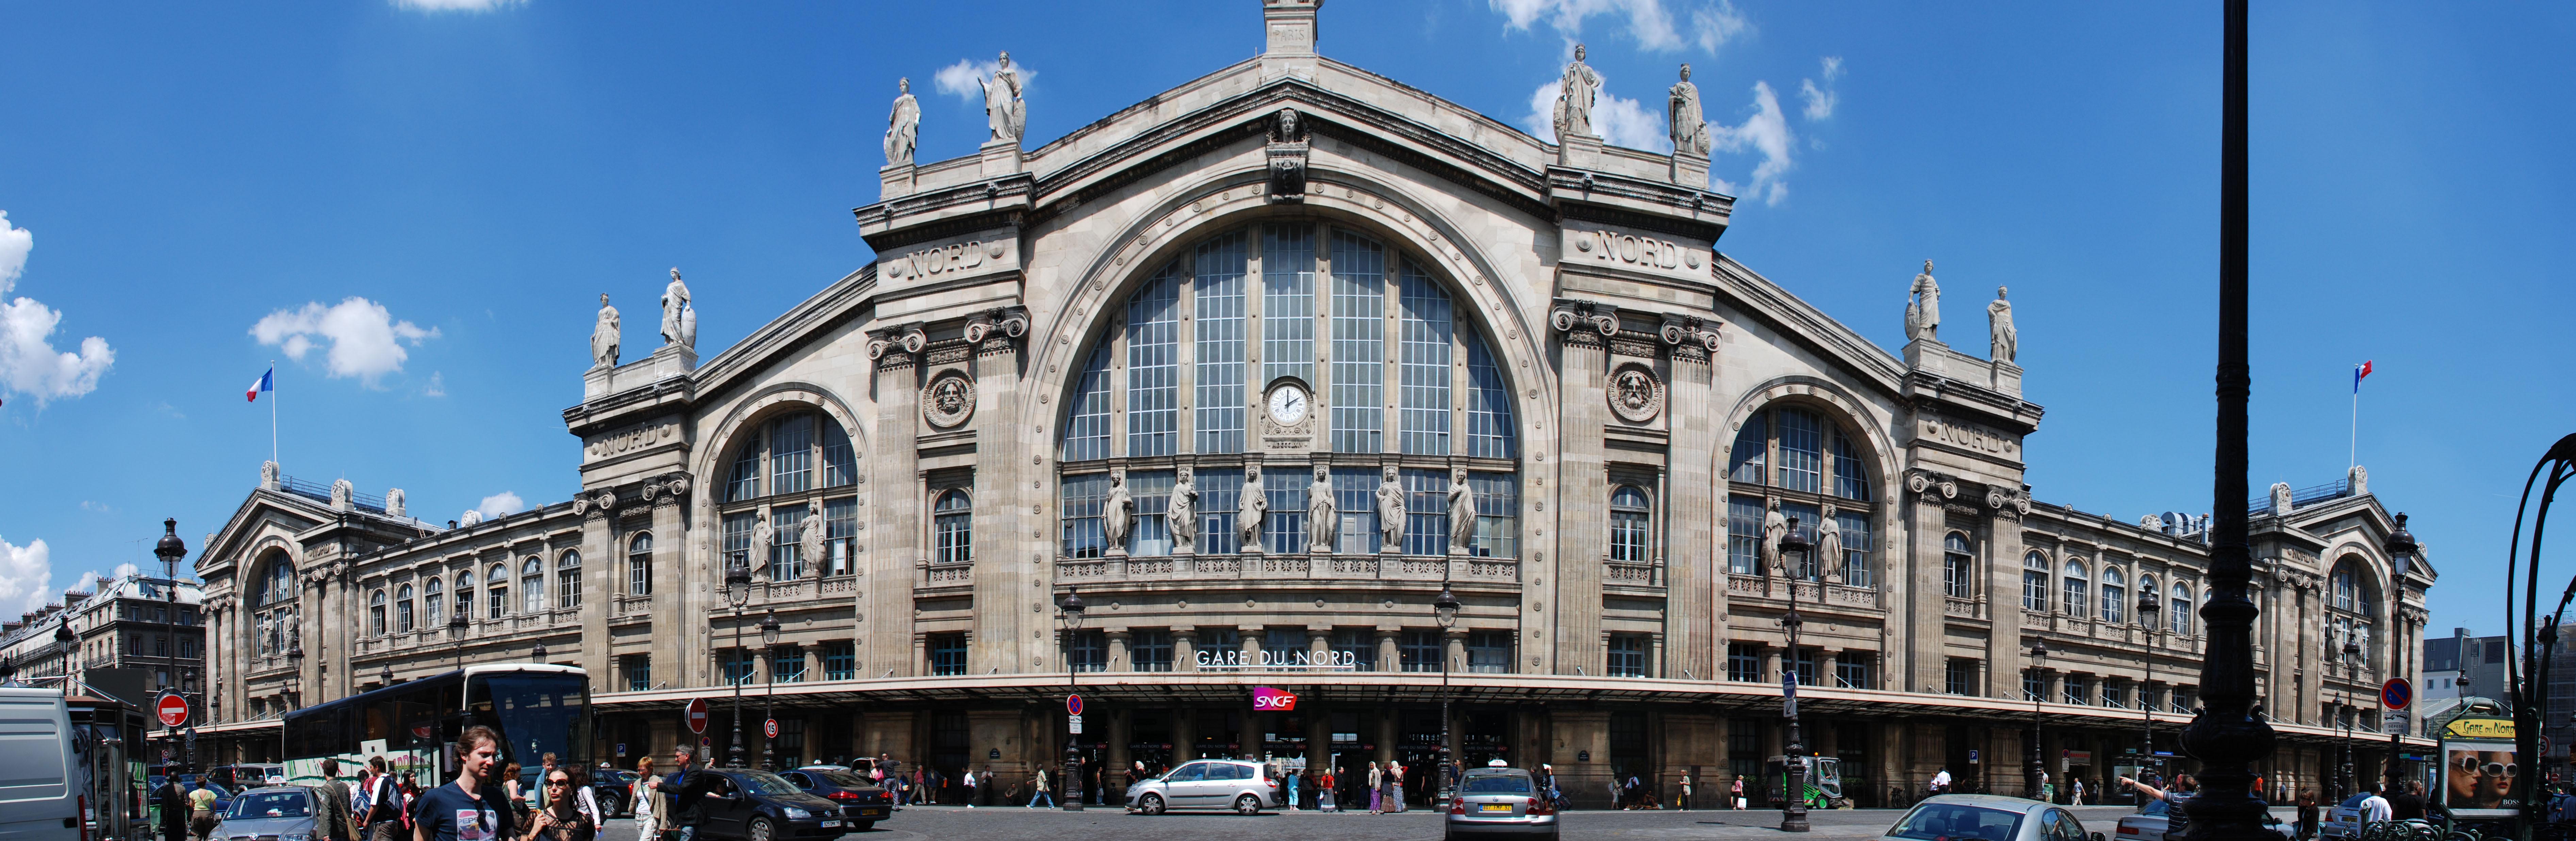 File:Paris Gare Du Nord Exterior.jpg - Wikimedia Commons